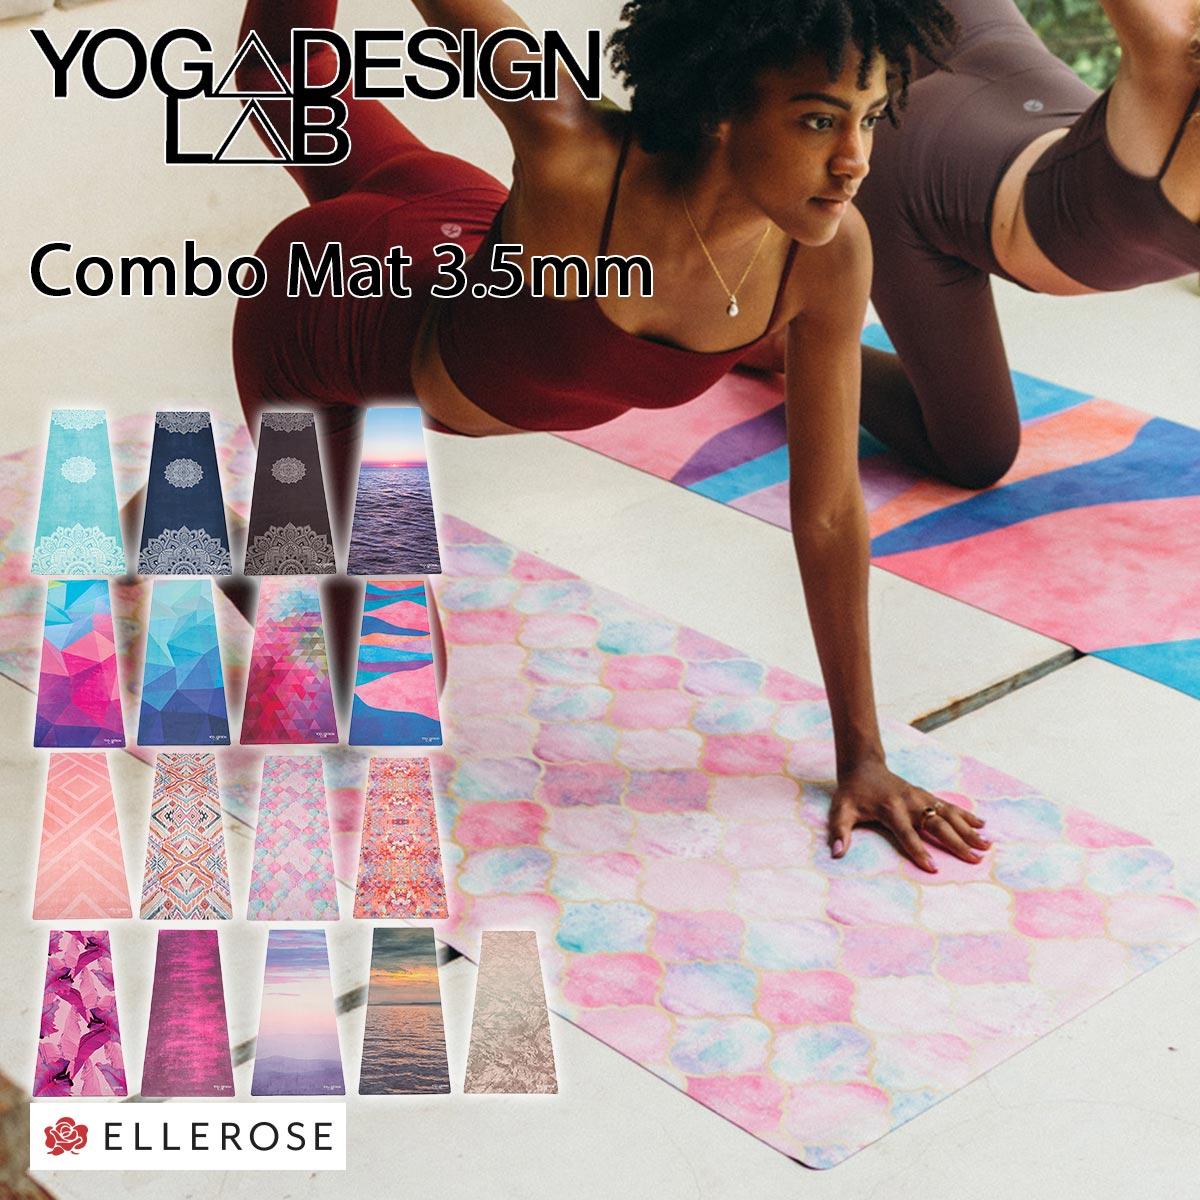 Style Depot Yoga Mats Yoga Design Lab Yogadesignlabo